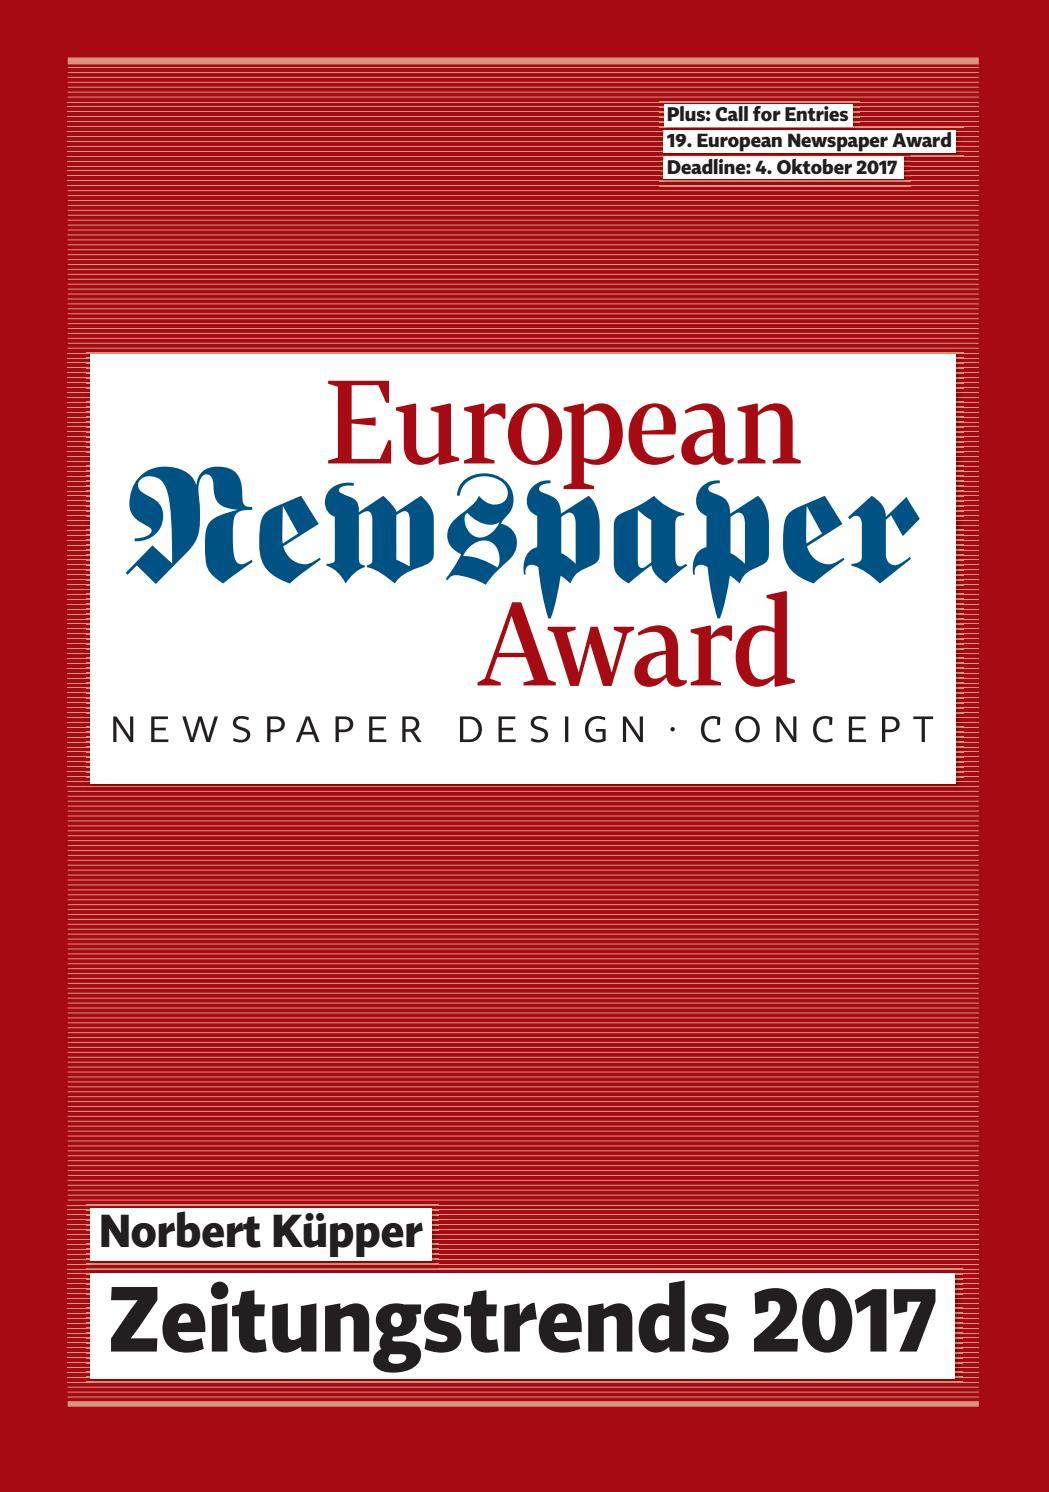 Call for Entries 19. European Newspaper Award by Norbert Kuepper - issuu